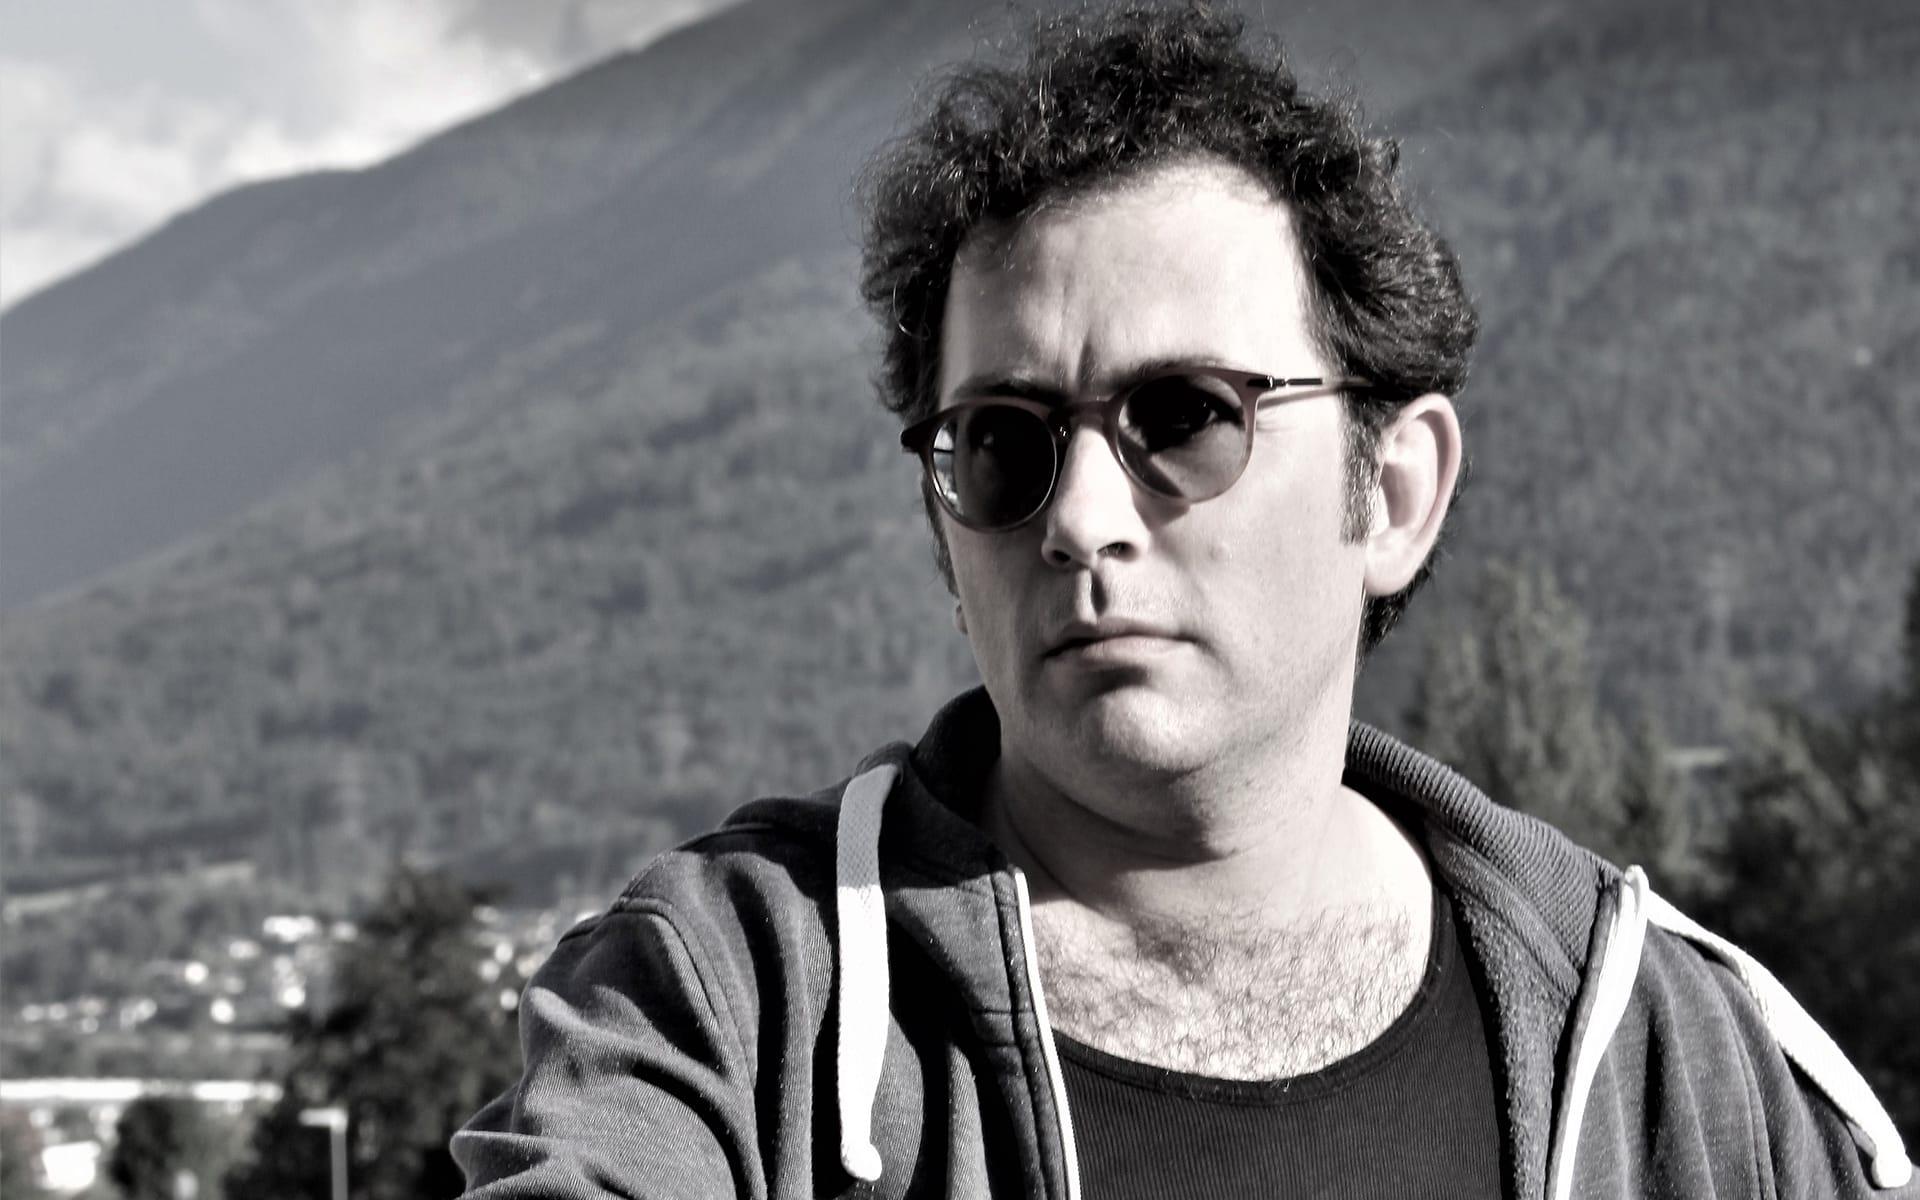 Thomas Rizzoli